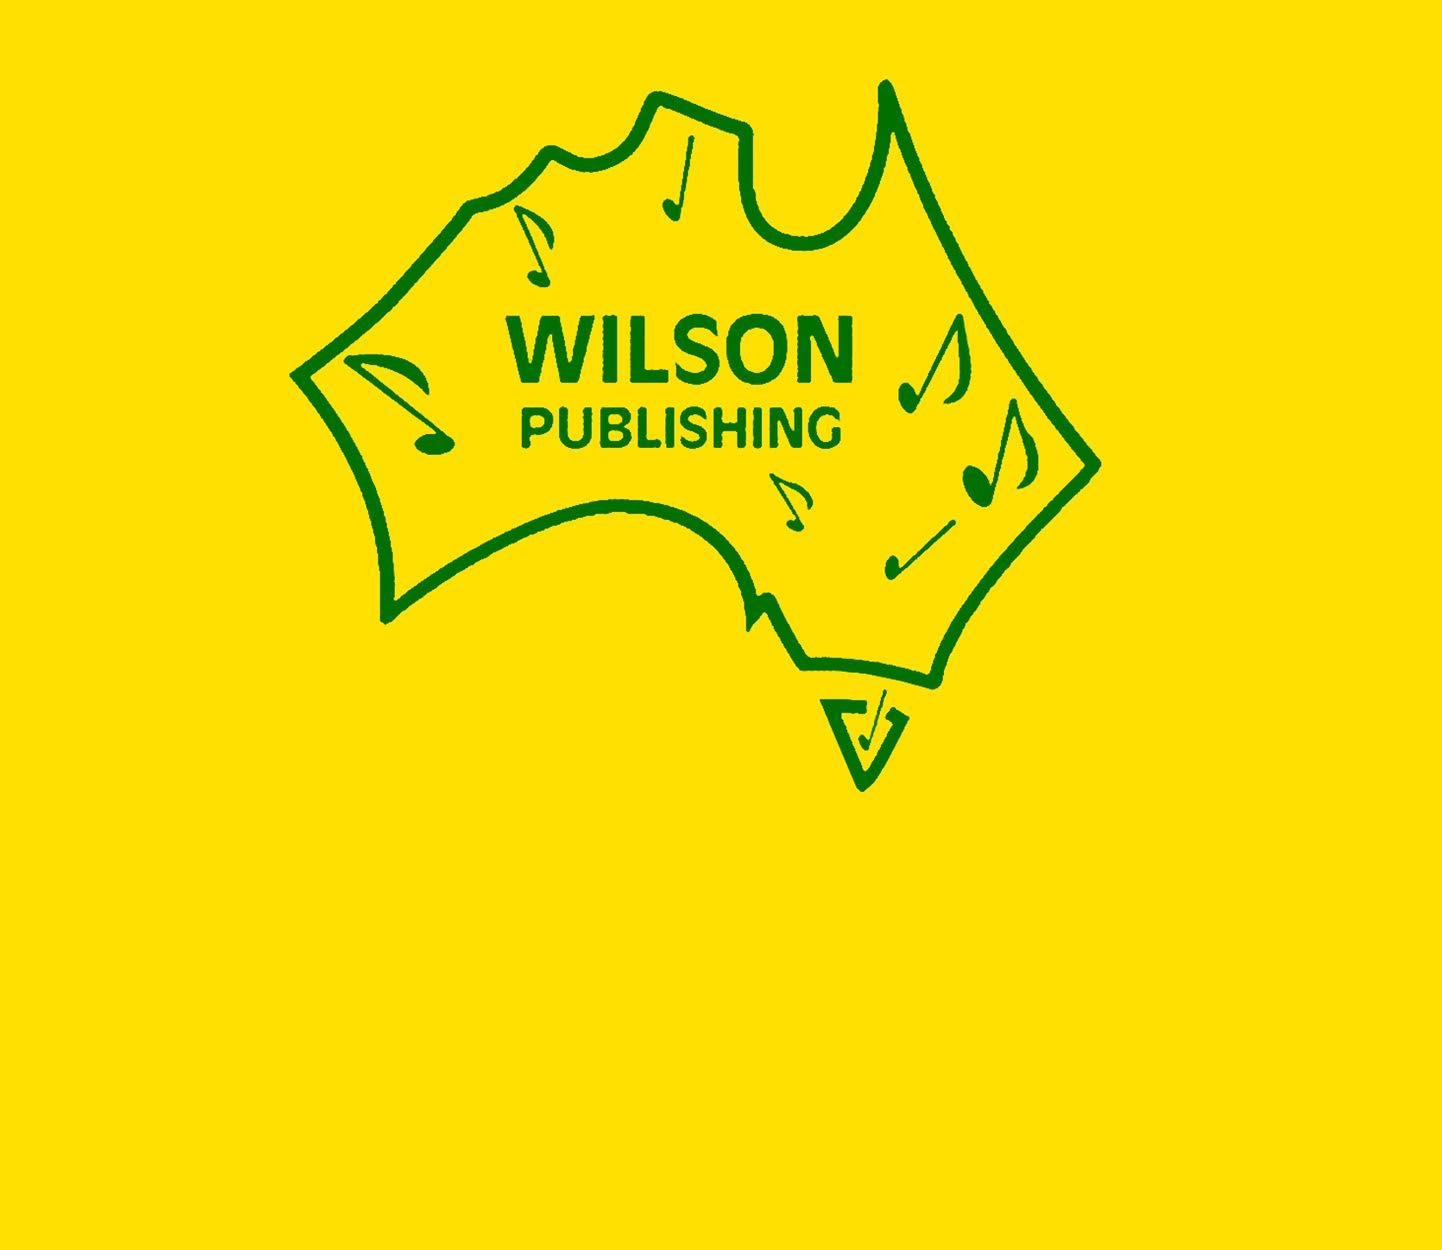 Wilson Publishing